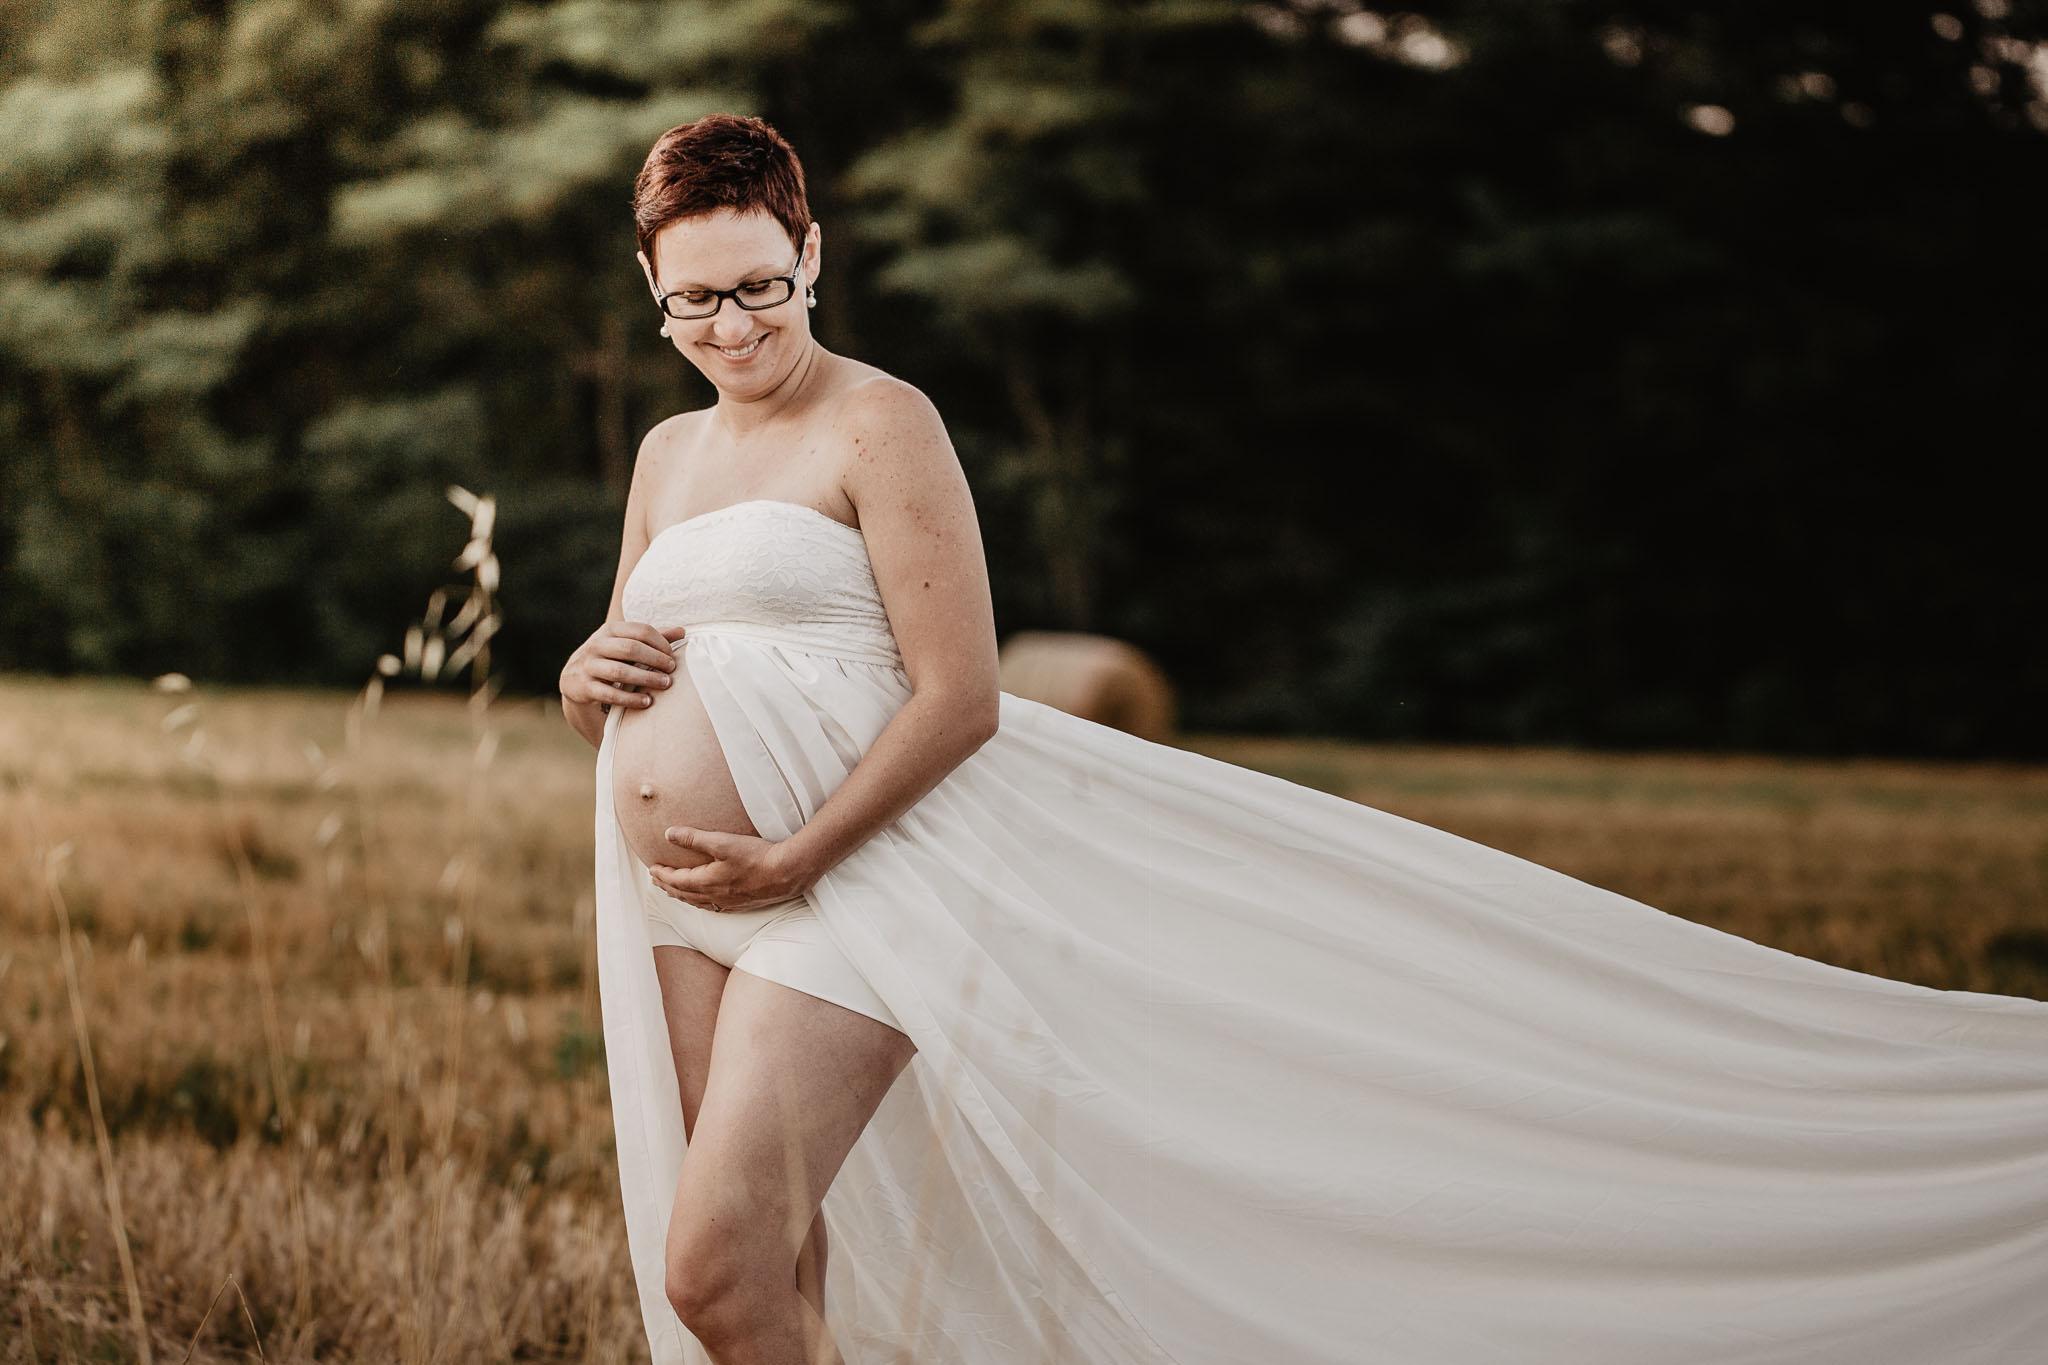 grossesse-femme-enceinte-couple-nature-campagne-ingold-photographe-65.jpg